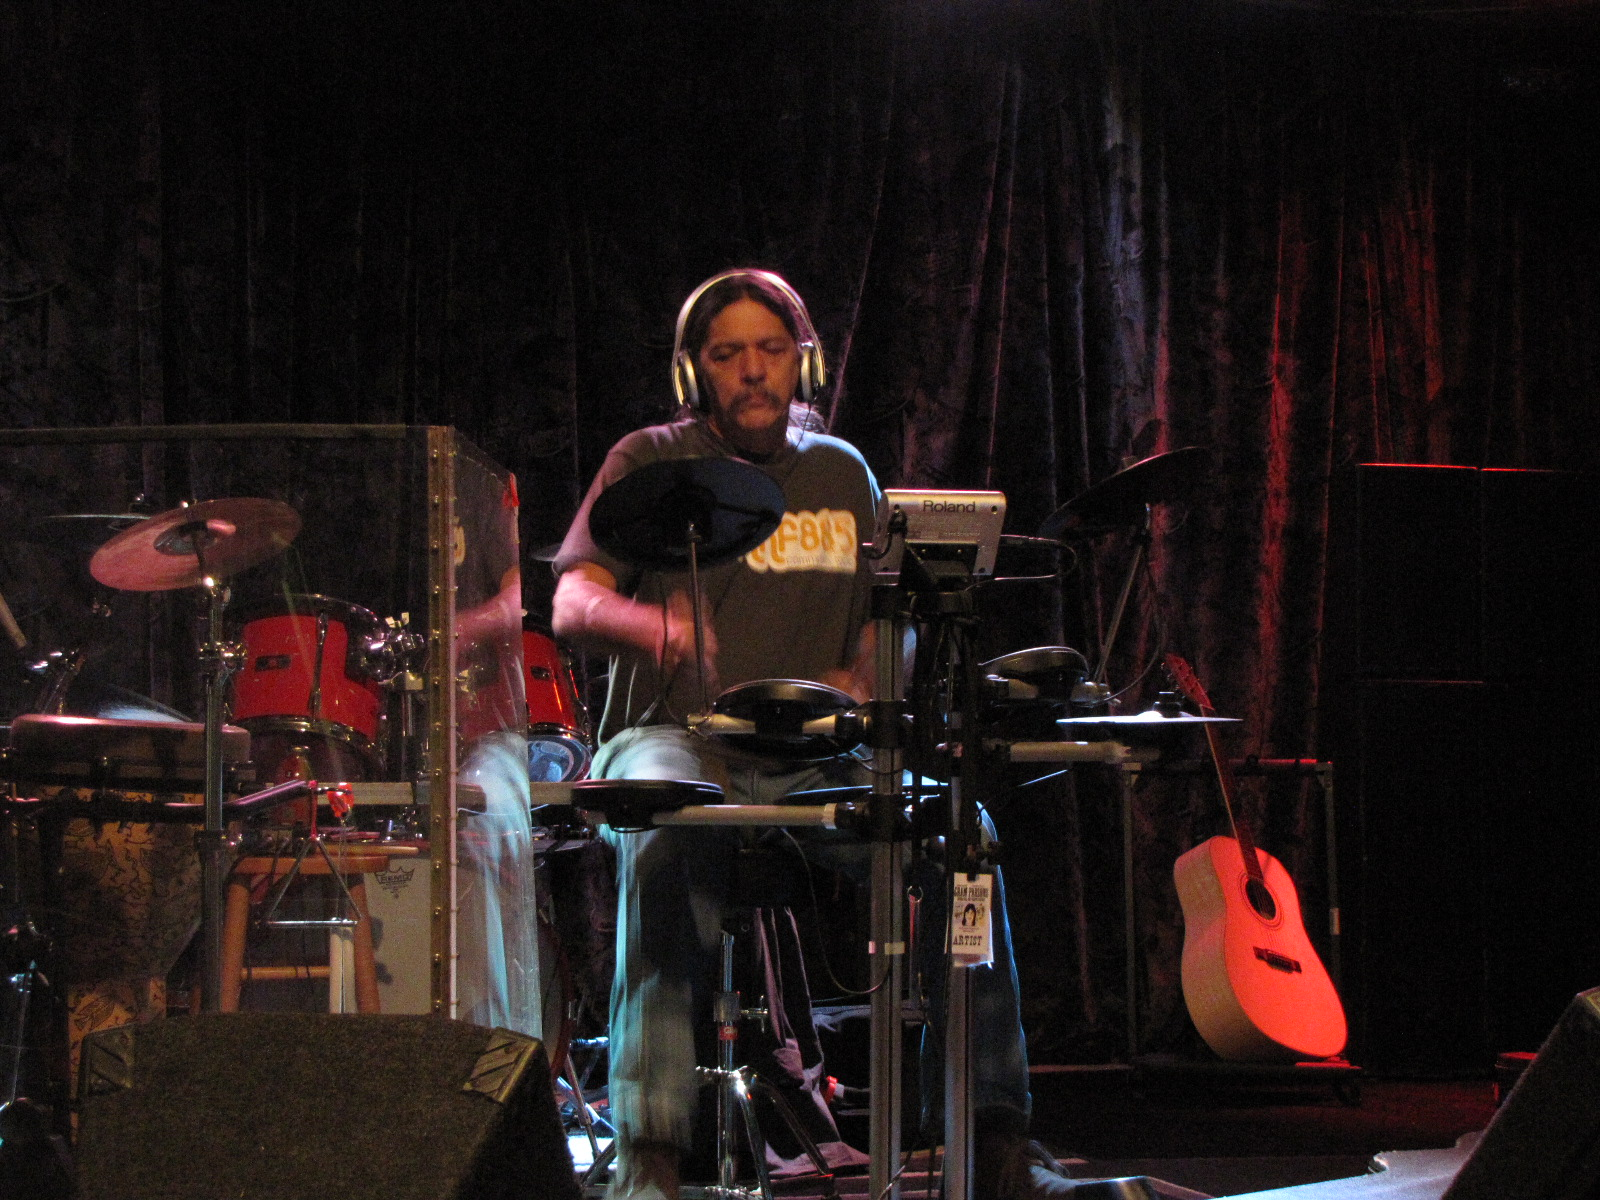 Bill-Drums_8816_S03.JPG